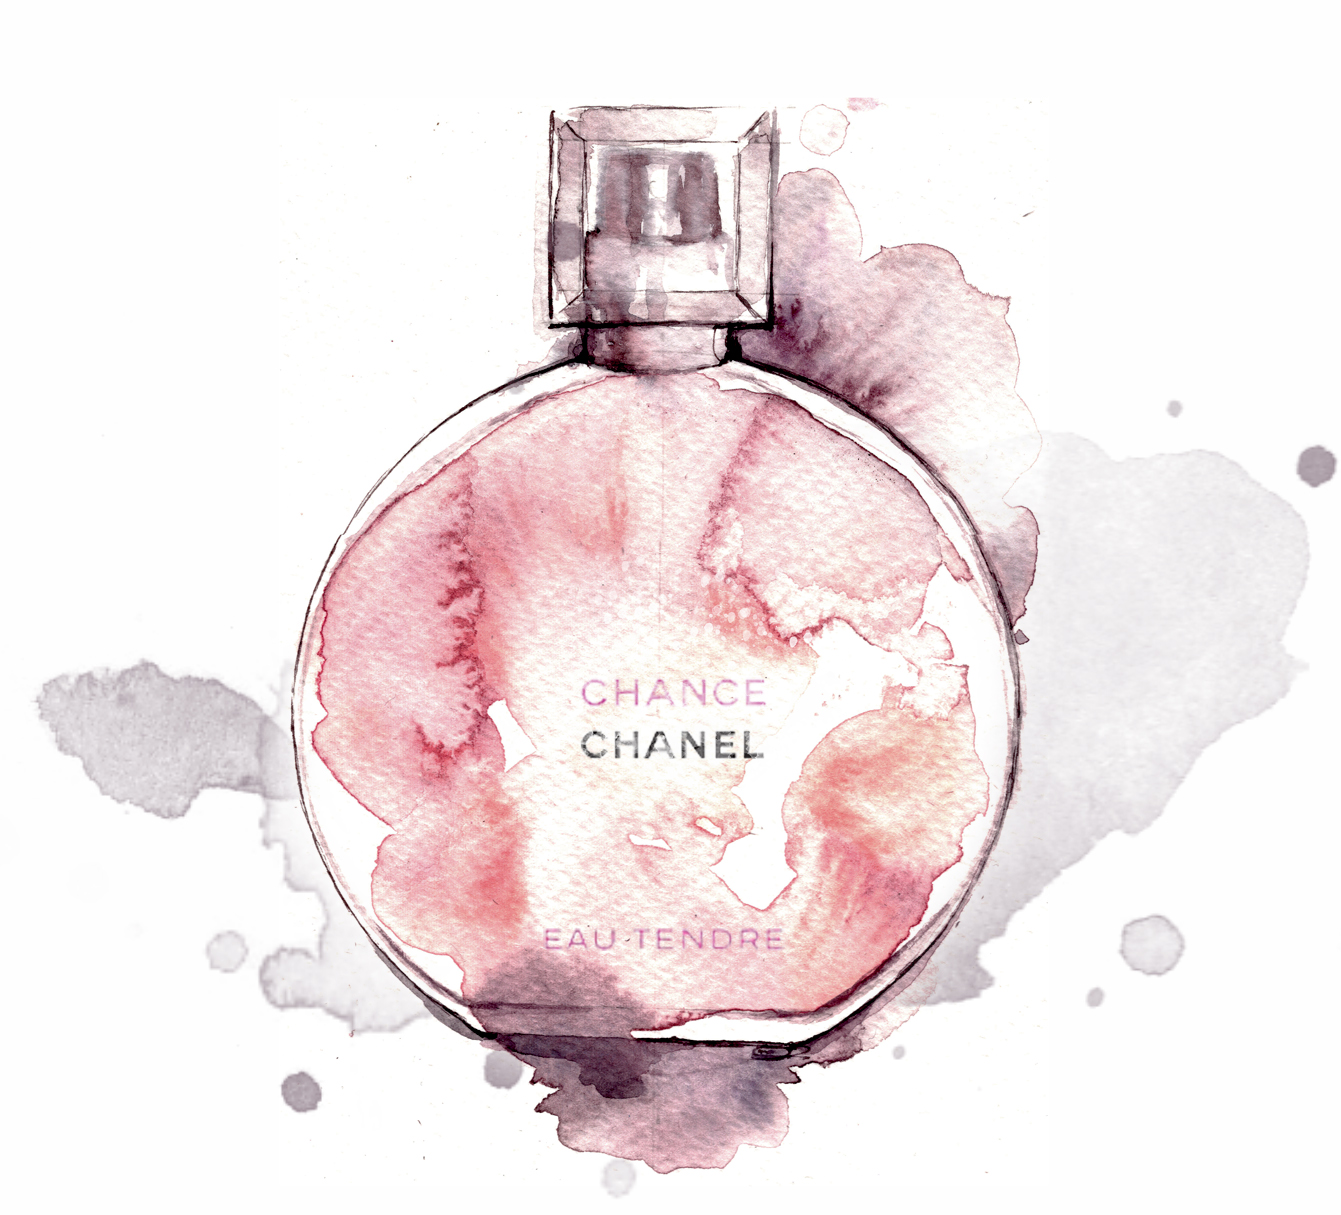 Chanel No 5 Perfume Label